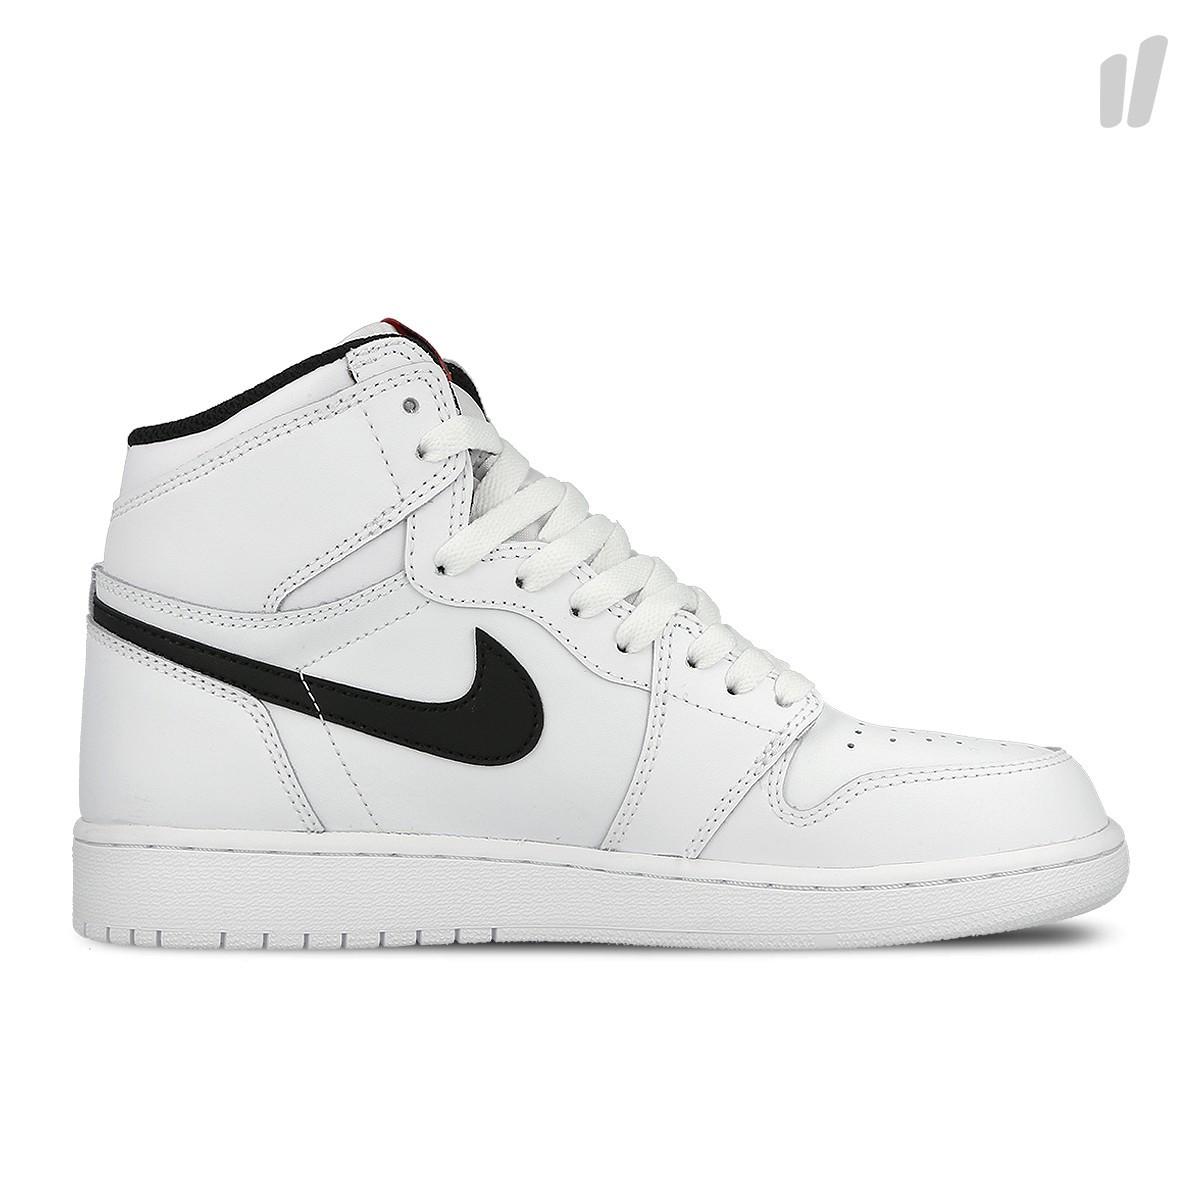 8152166a578d Кроссовки Nike Air Jordan 1 Retro High OG BG Оригинал - Fan Town в Житомире